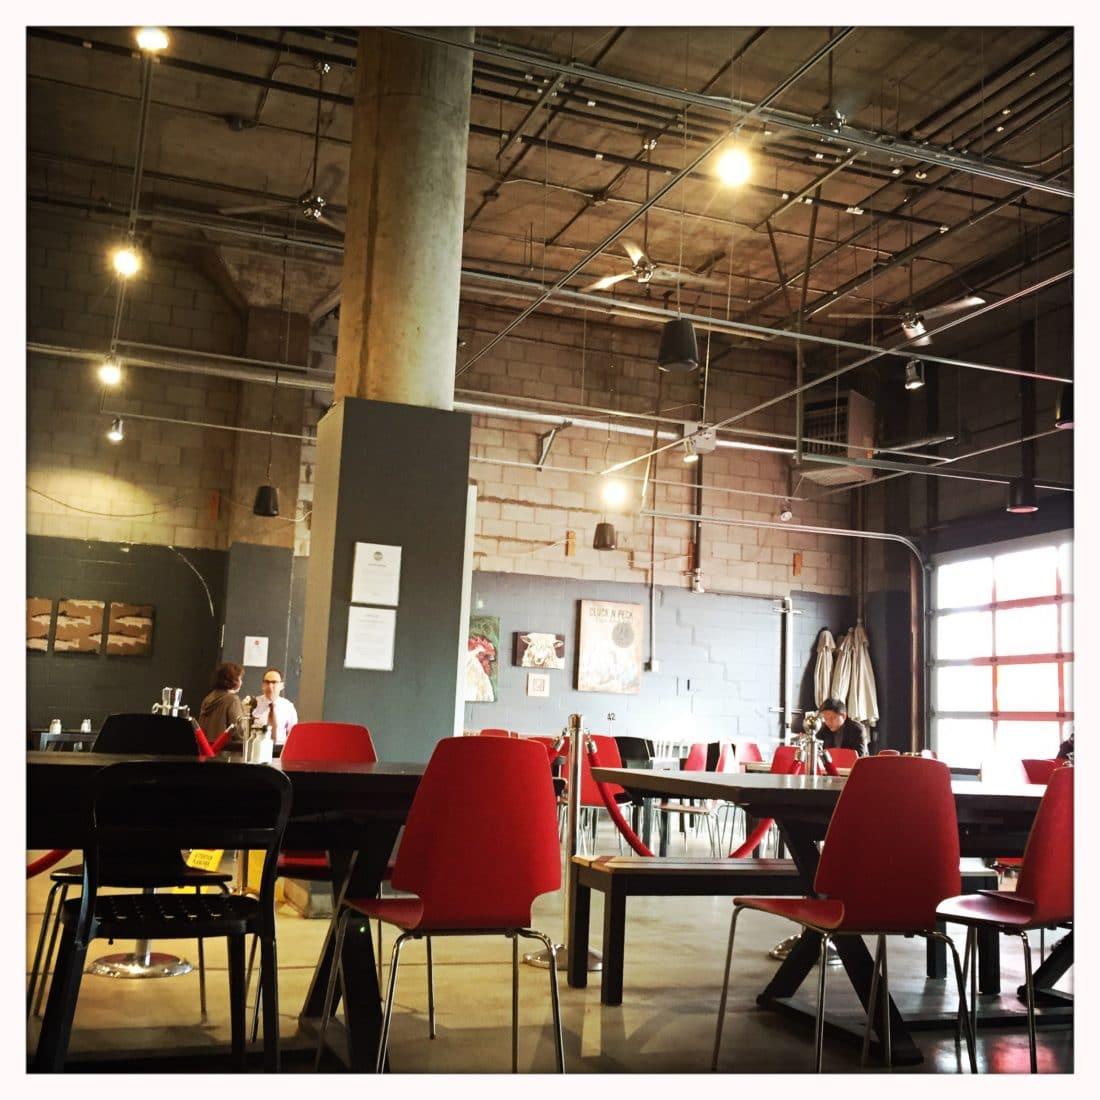 This is art bakery Ottawa interior